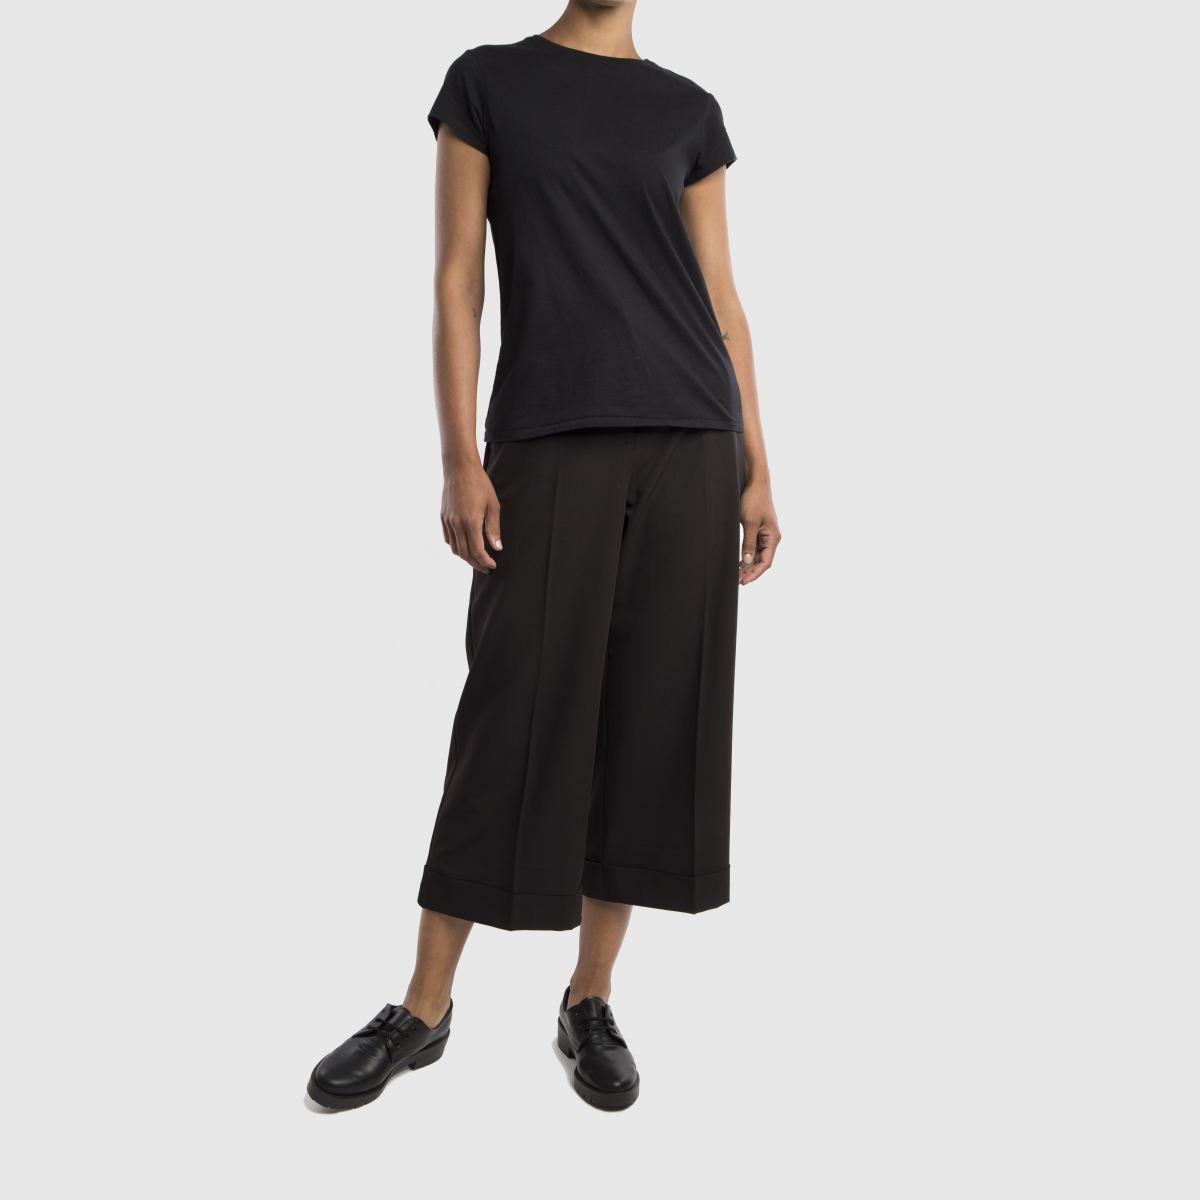 Damen Schwarz schuh Confident Flats | schuh Gute Qualität beliebte Schuhe